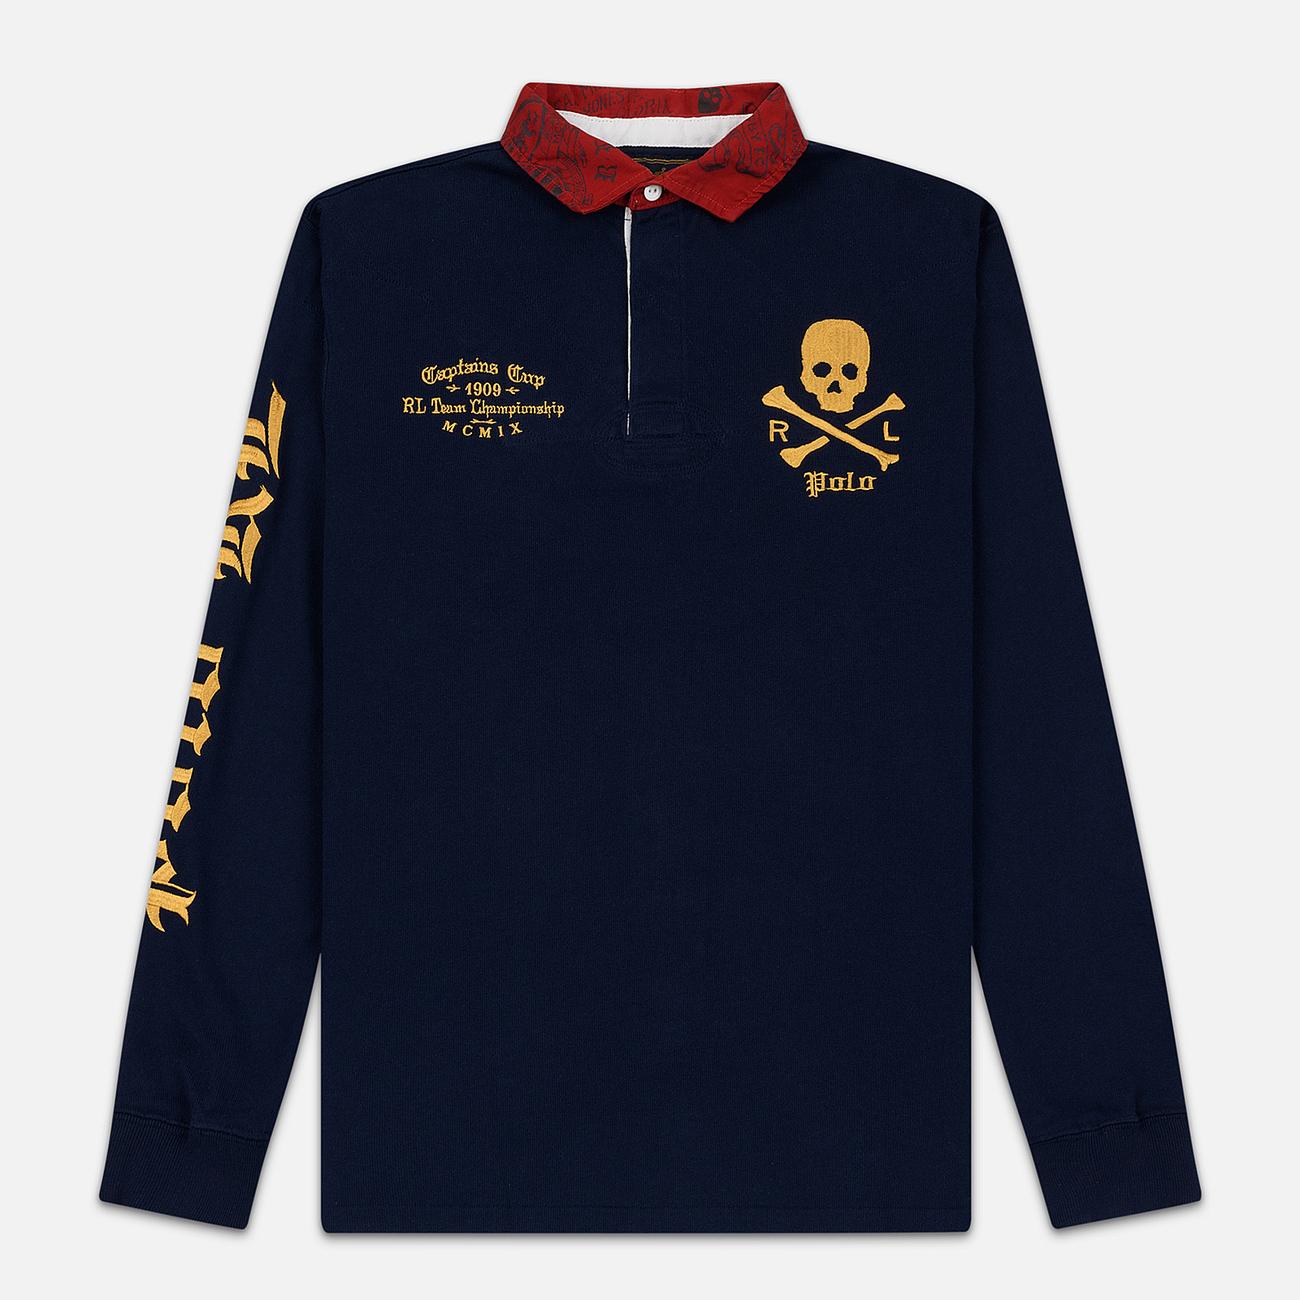 Мужской лонгслив Polo Ralph Lauren Skull And Crossbones Emblem Rugby Cruise Navy